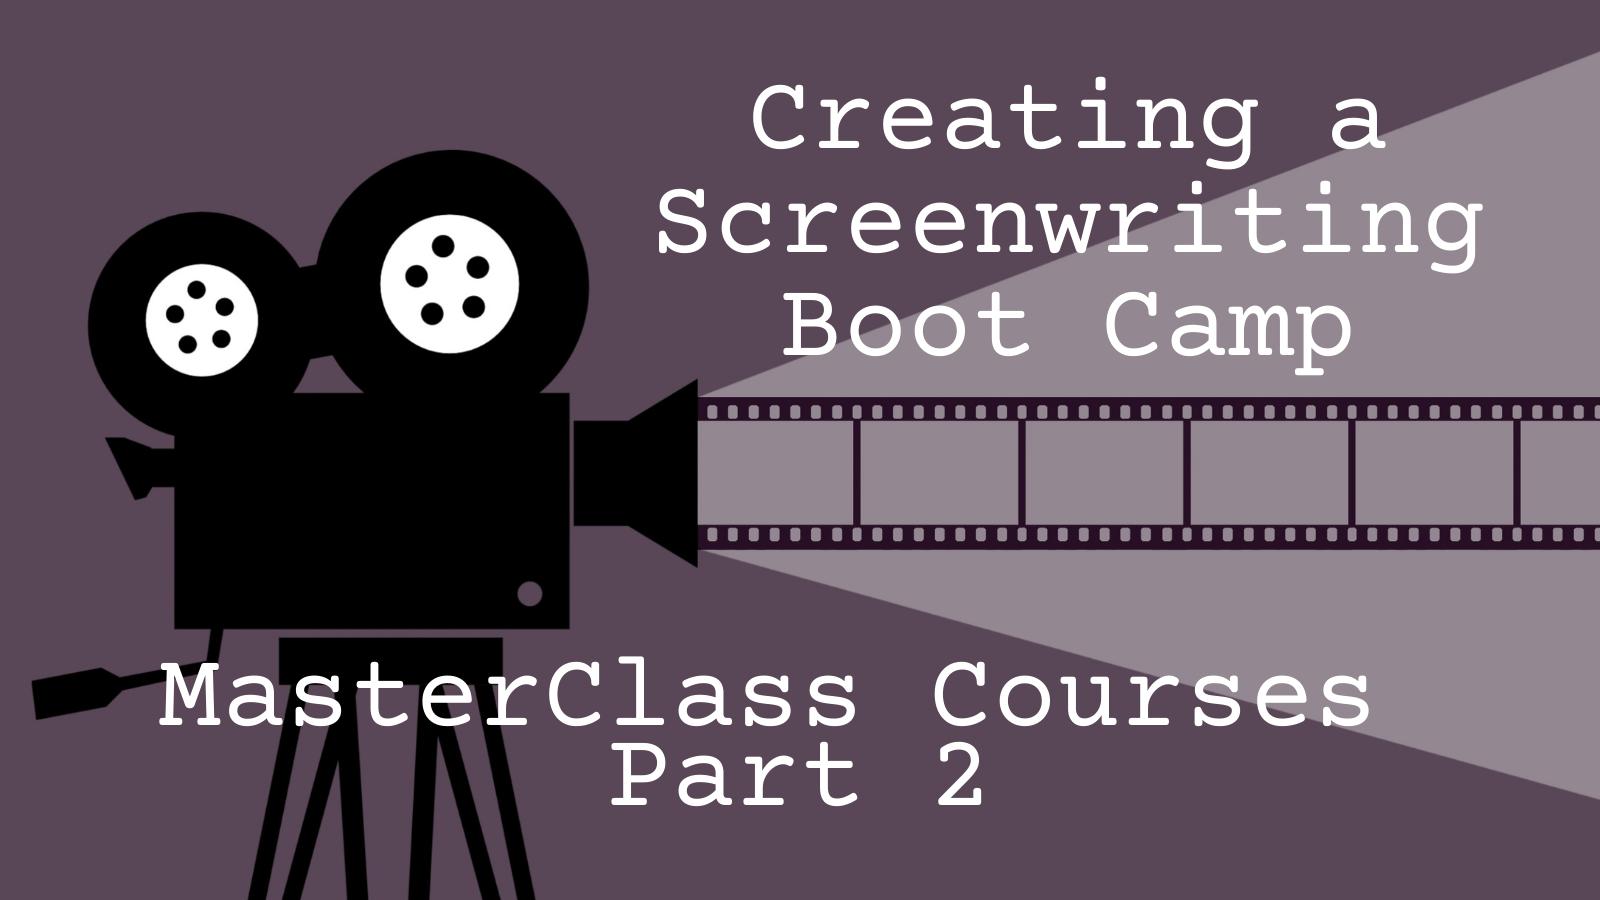 My Screenwriting Bootcamp: MasterClass Part 2